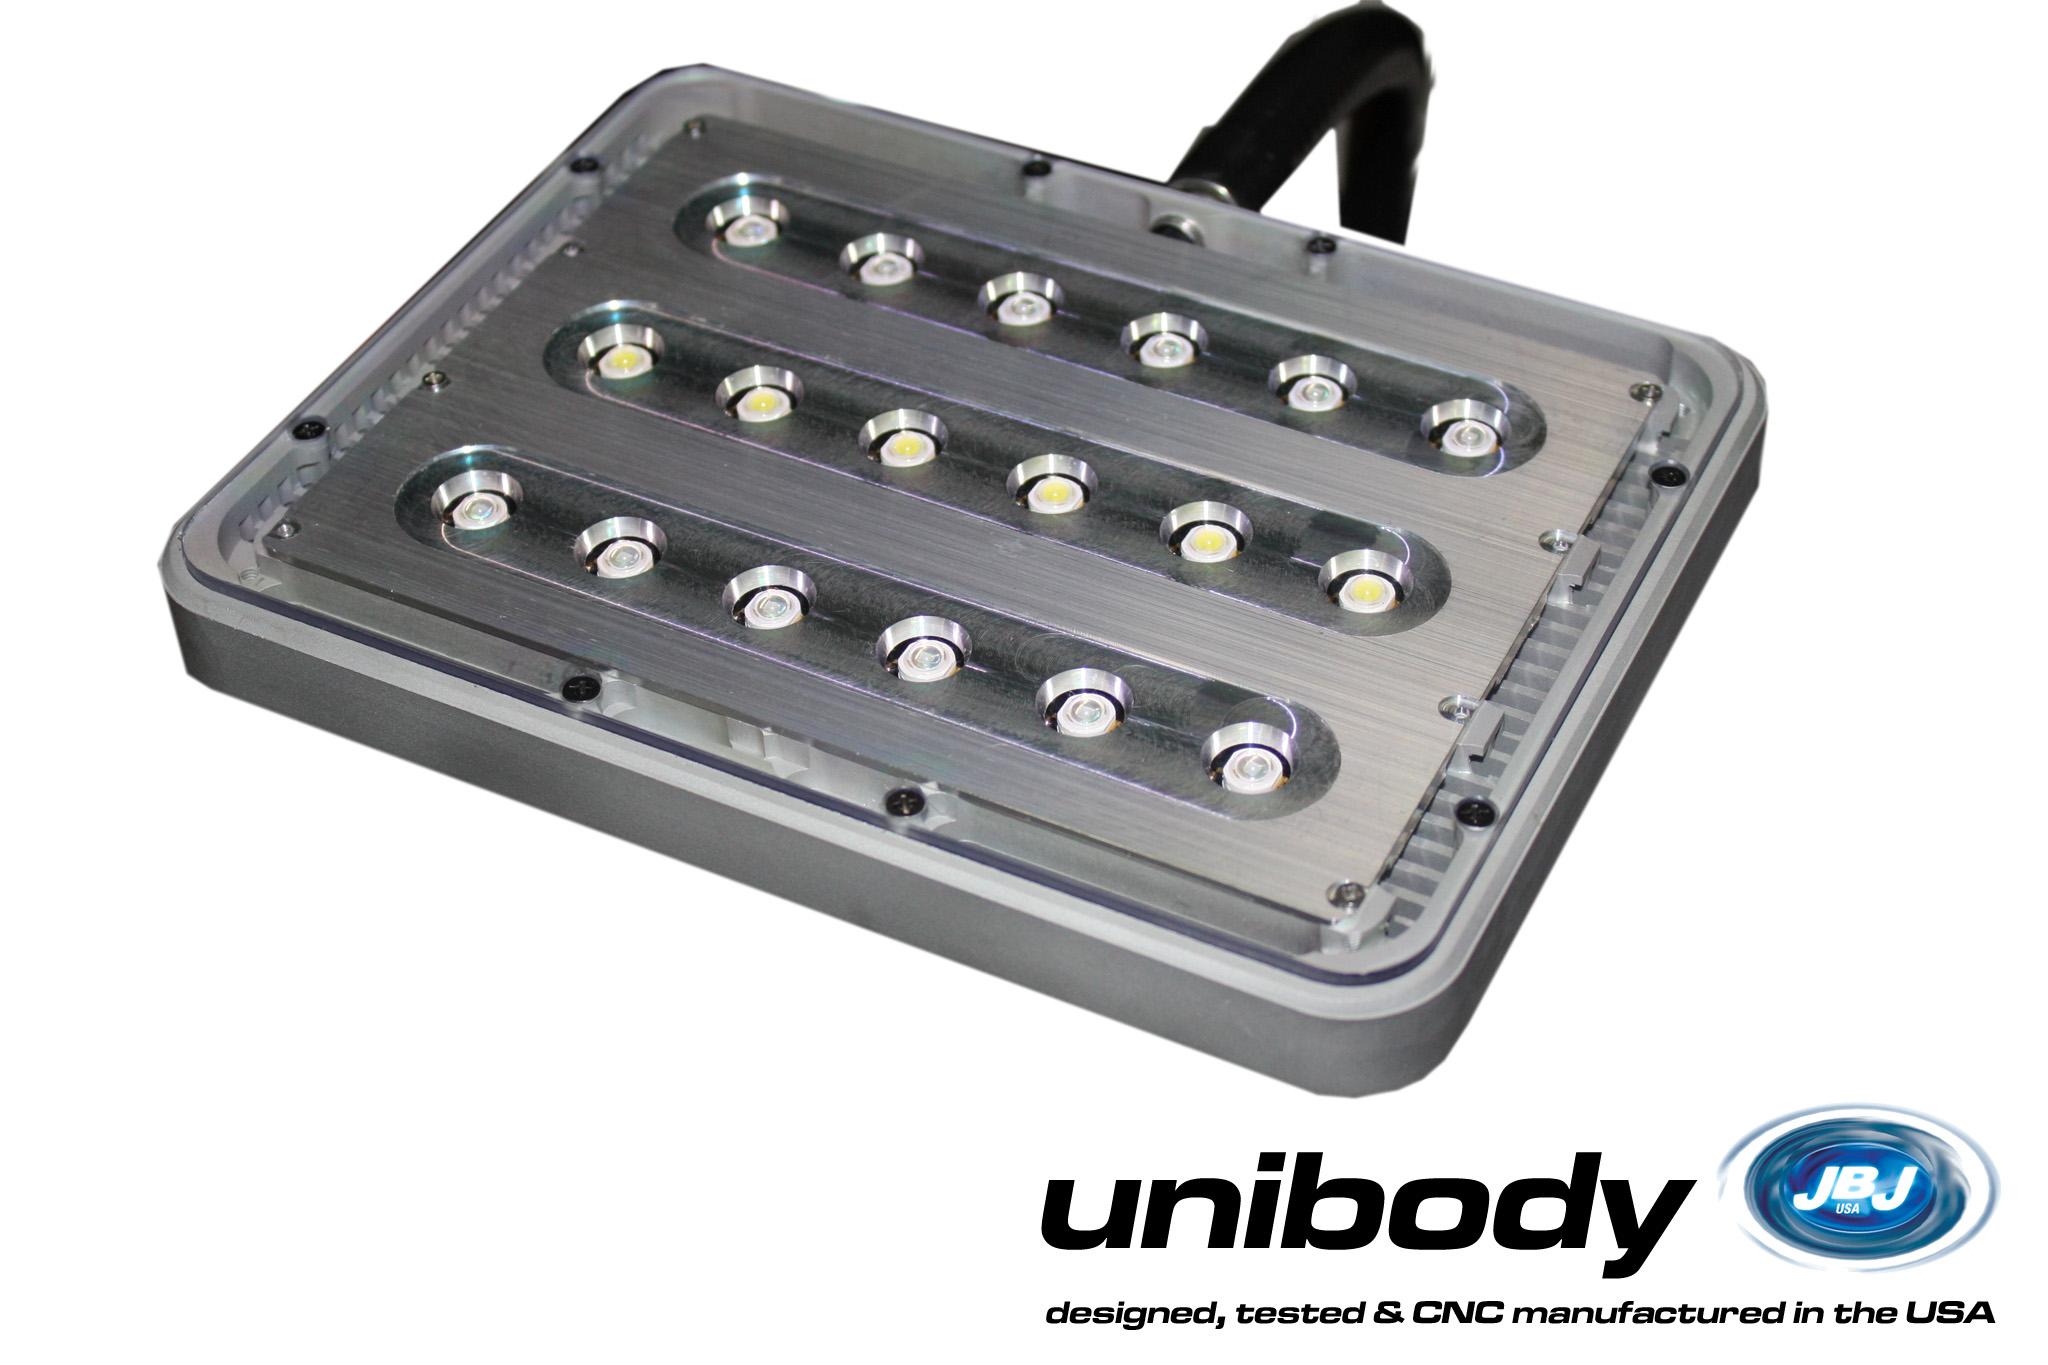 JBJ Unibody LED Underside